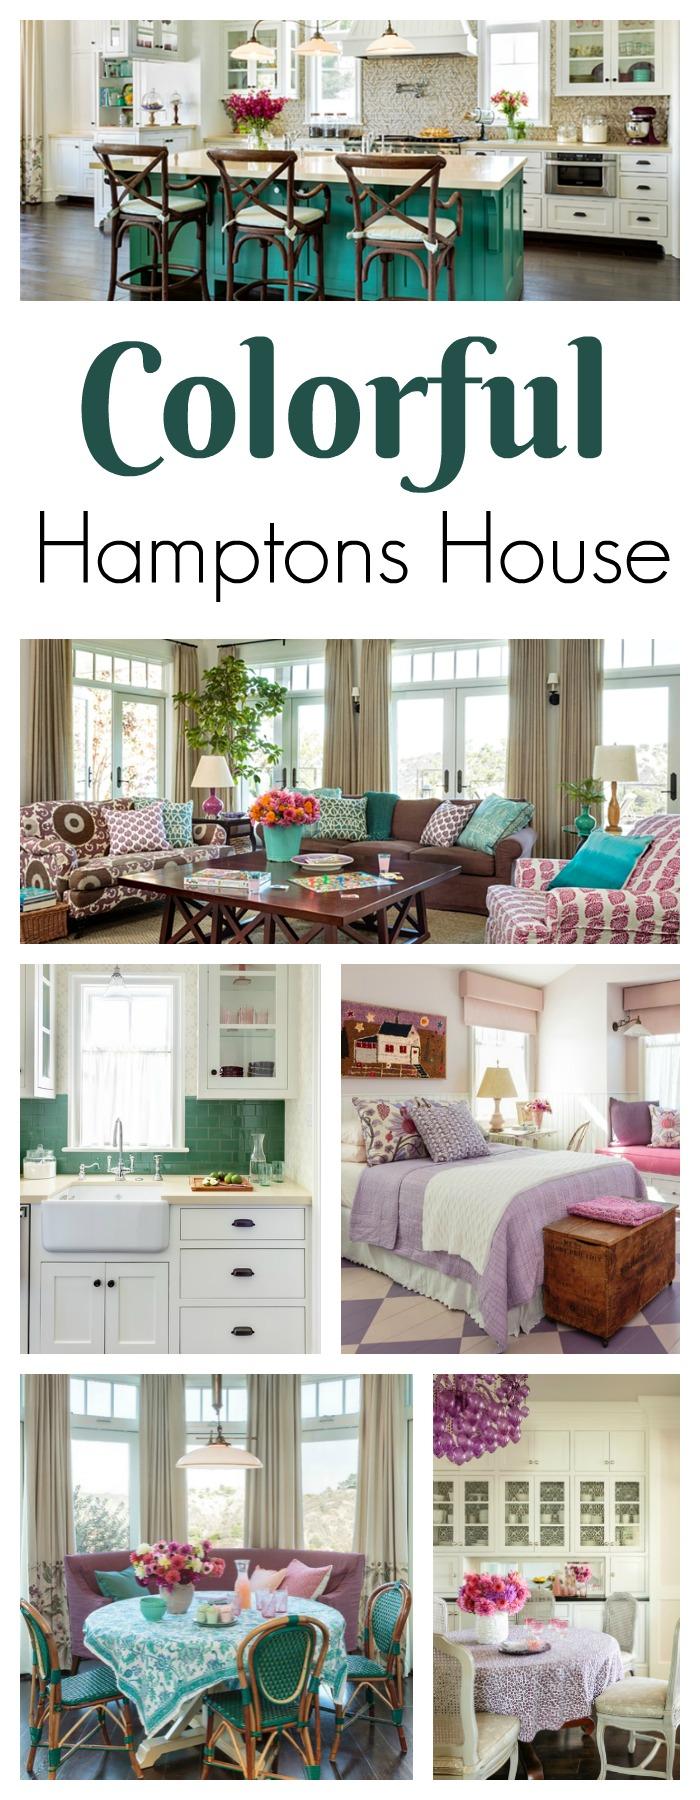 take a tour of a colorful hamptons house - Tour Of The Hamptons